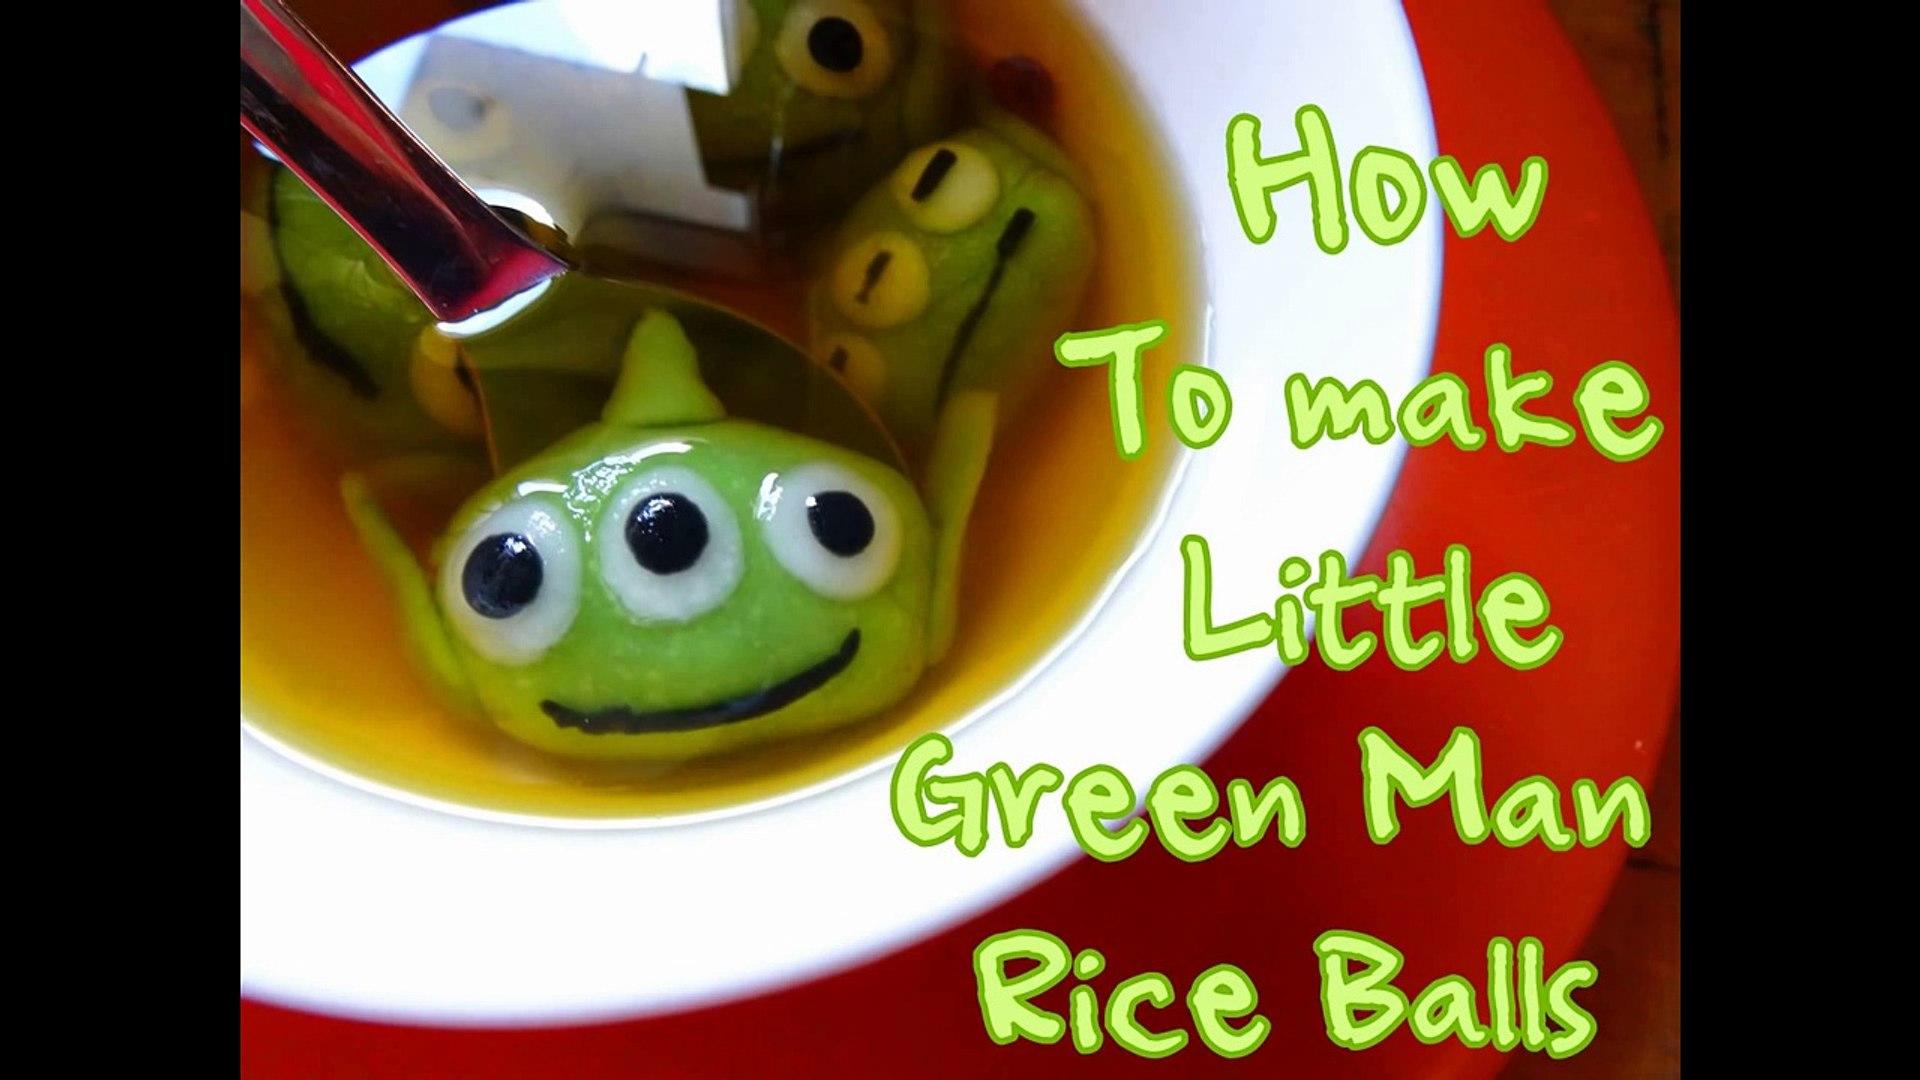 How to make Little Green Man Rice Balls 三眼仔湯圓-EpJsYOwLTDQ